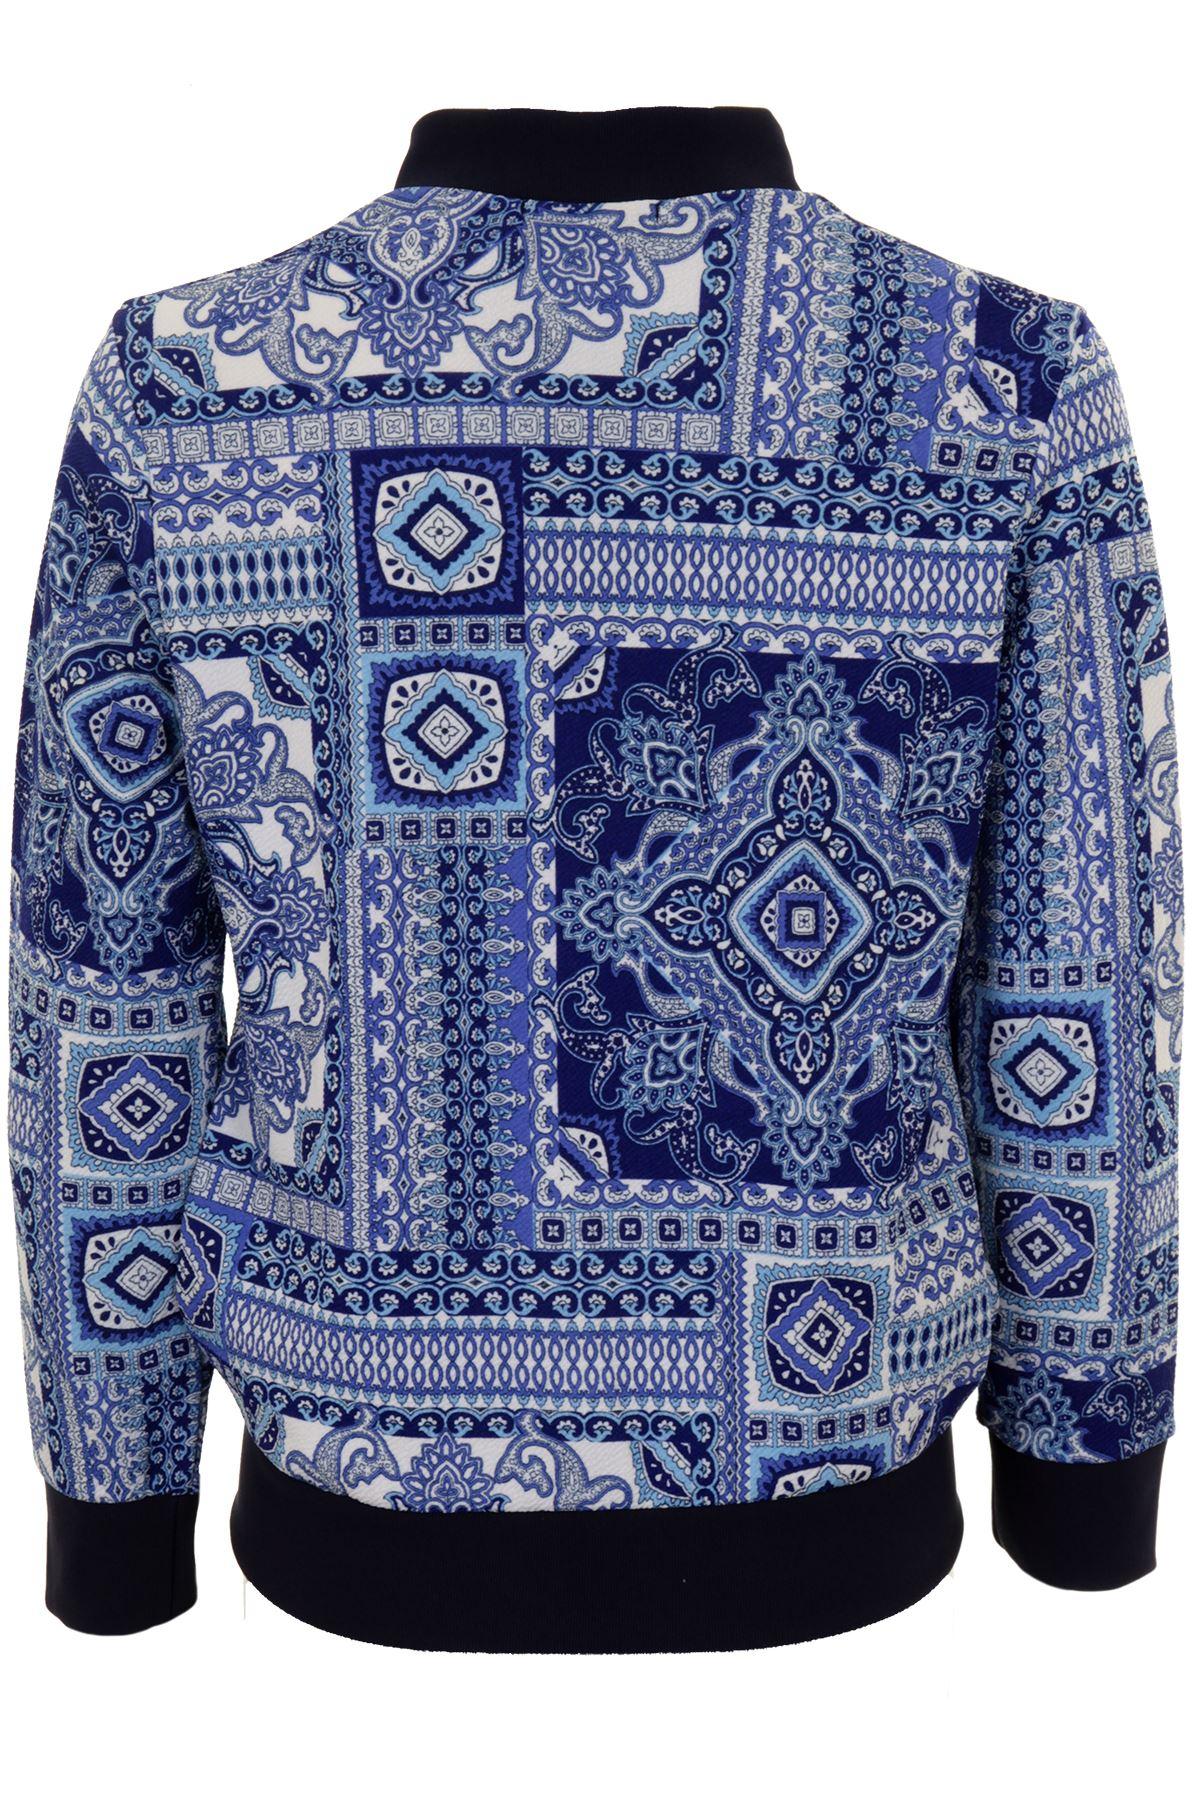 Ladies Vibrant Paisley Print Baseball Style Zip Up Hoodie Thin Bomber Jacket